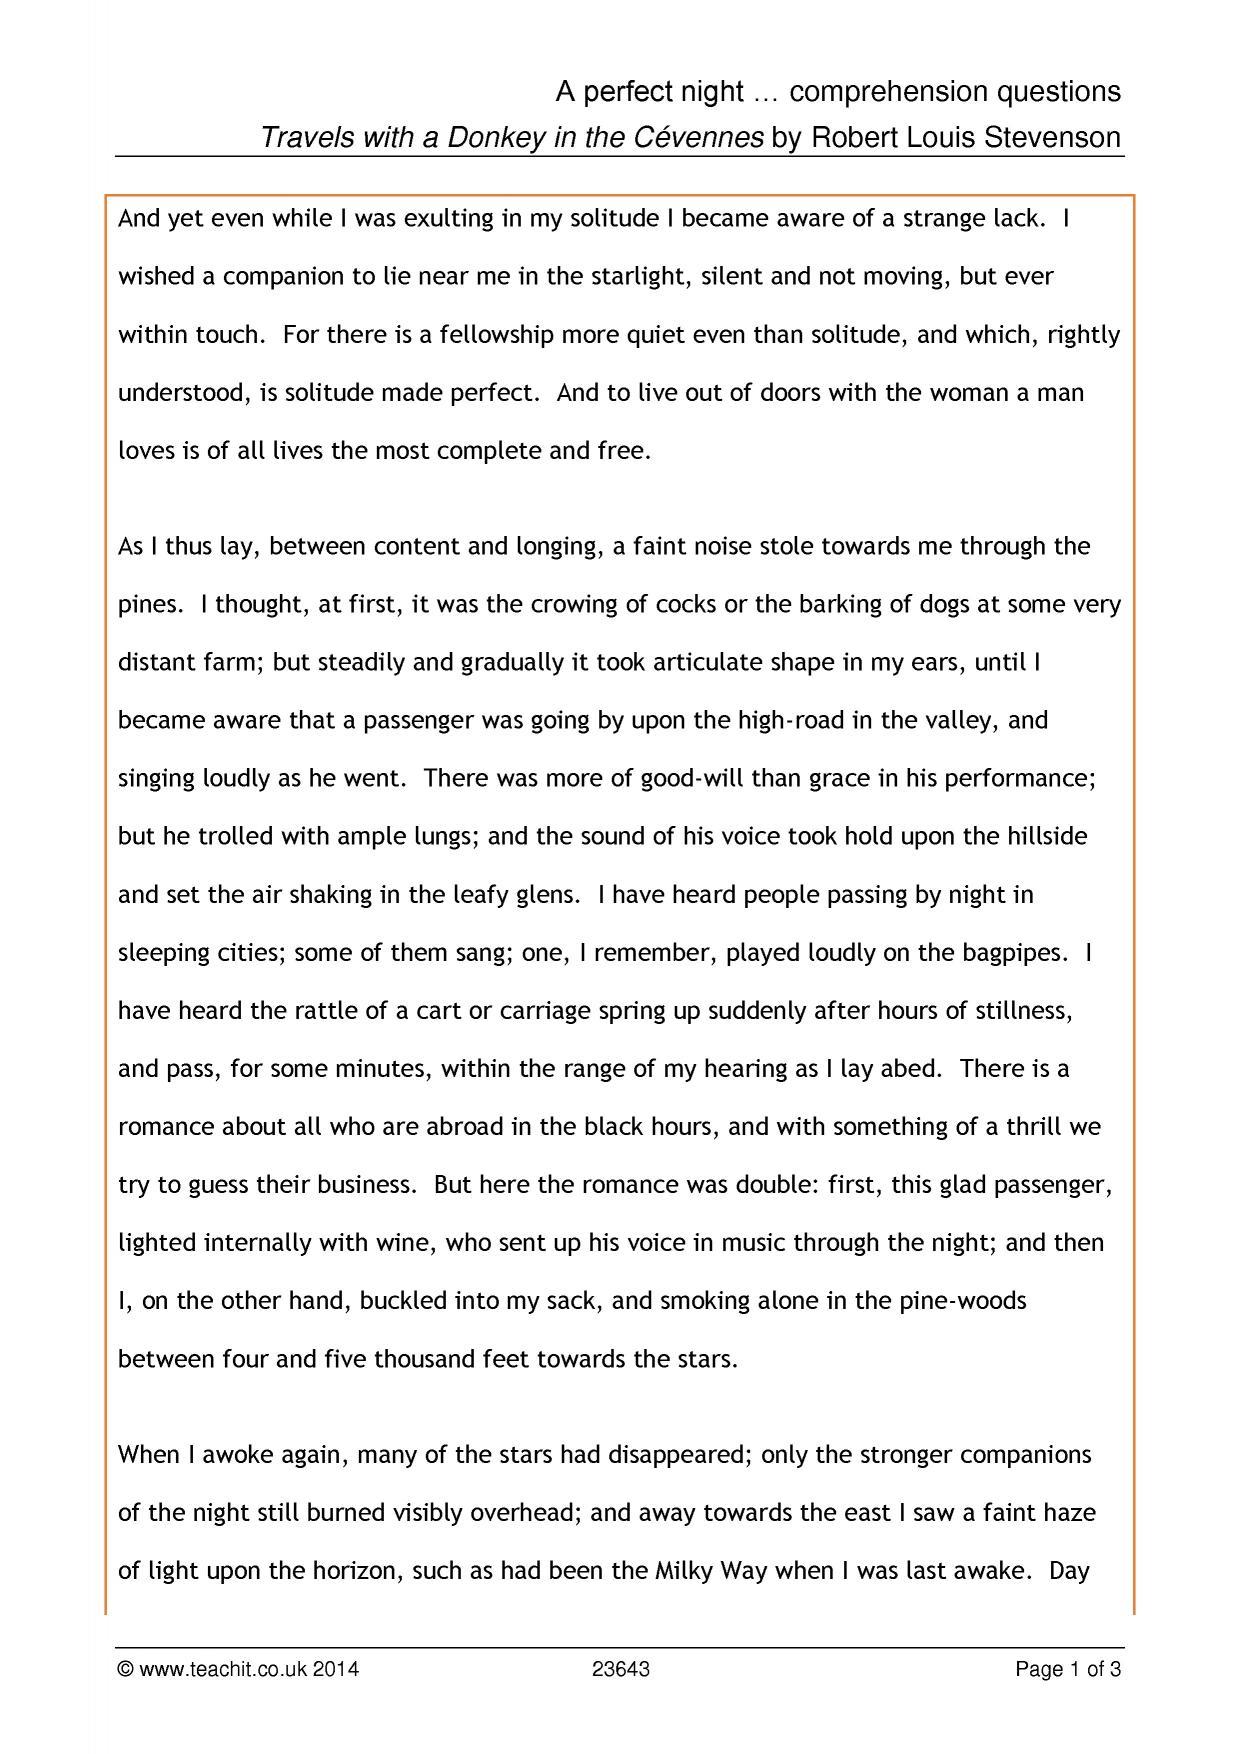 Ks3 reading critical reading teachit english 1 preview ccuart Choice Image